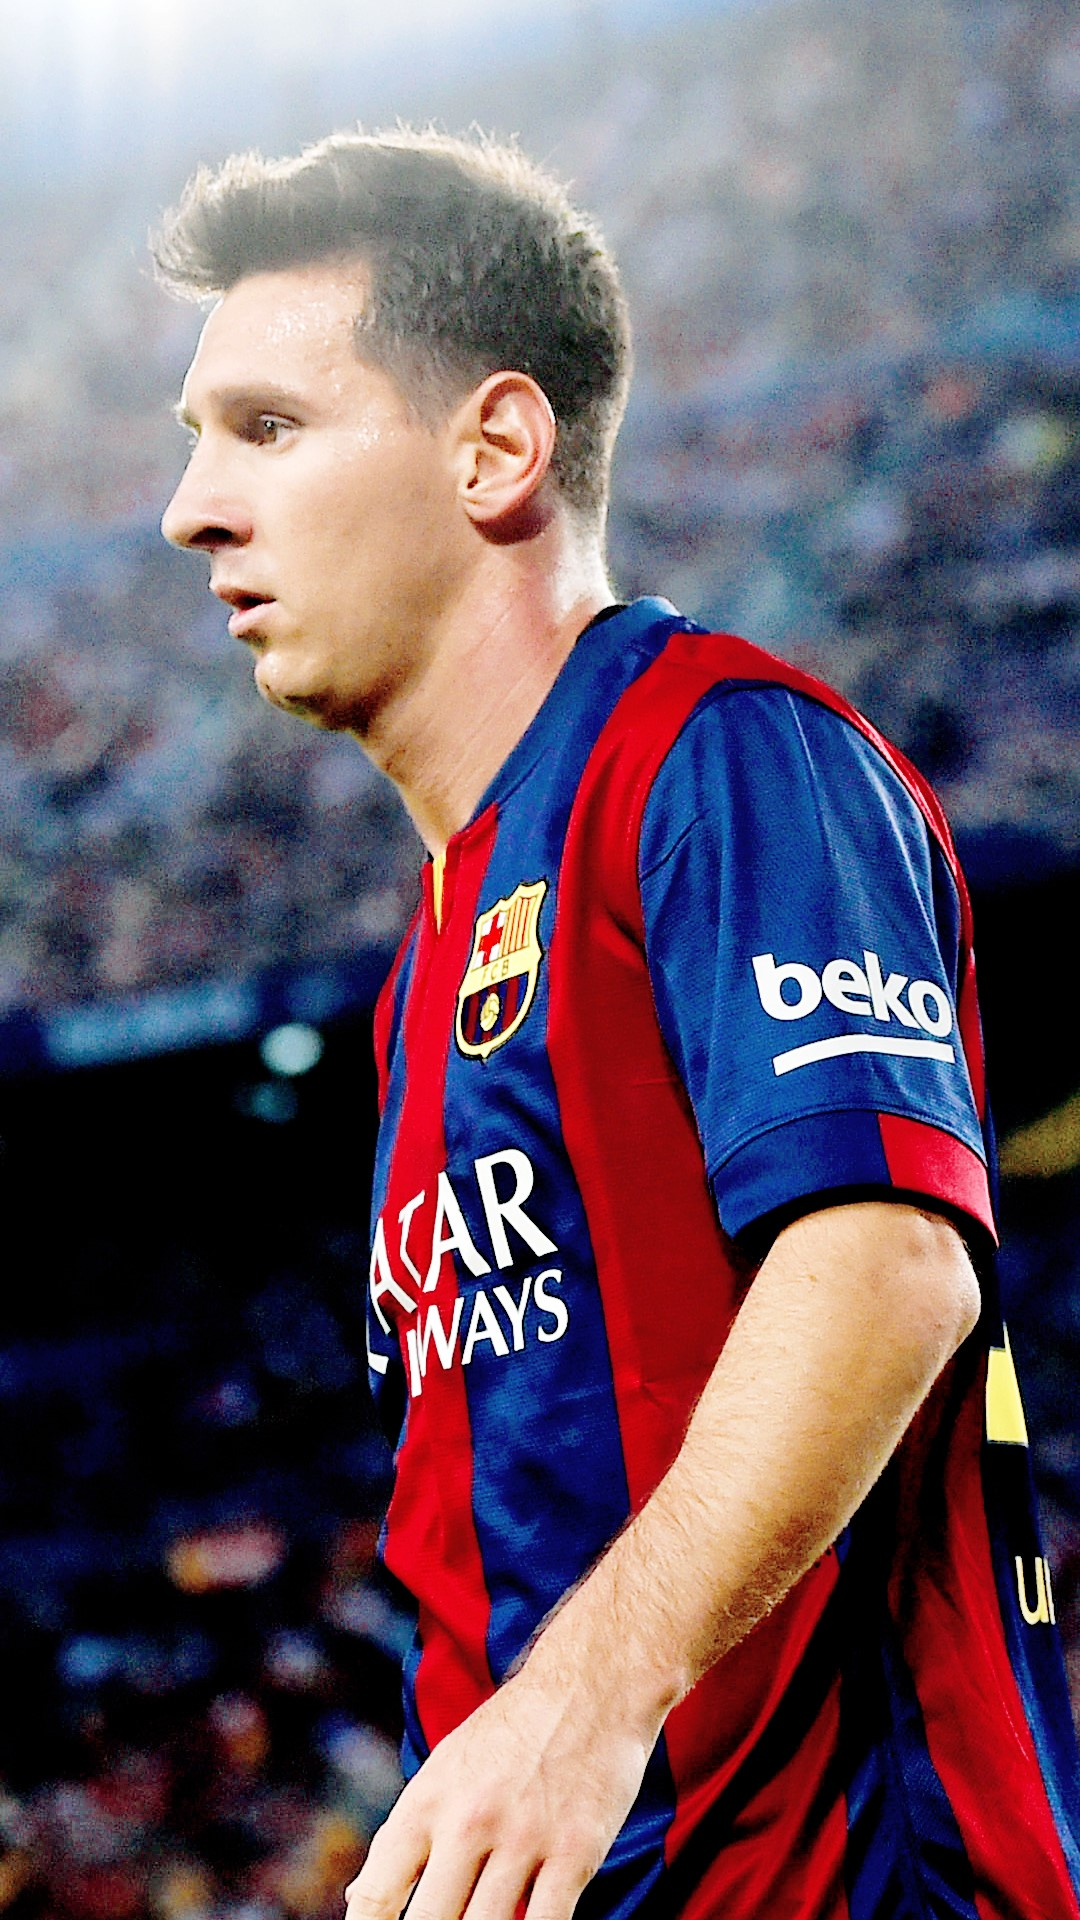 Pictures of Lionel Messi